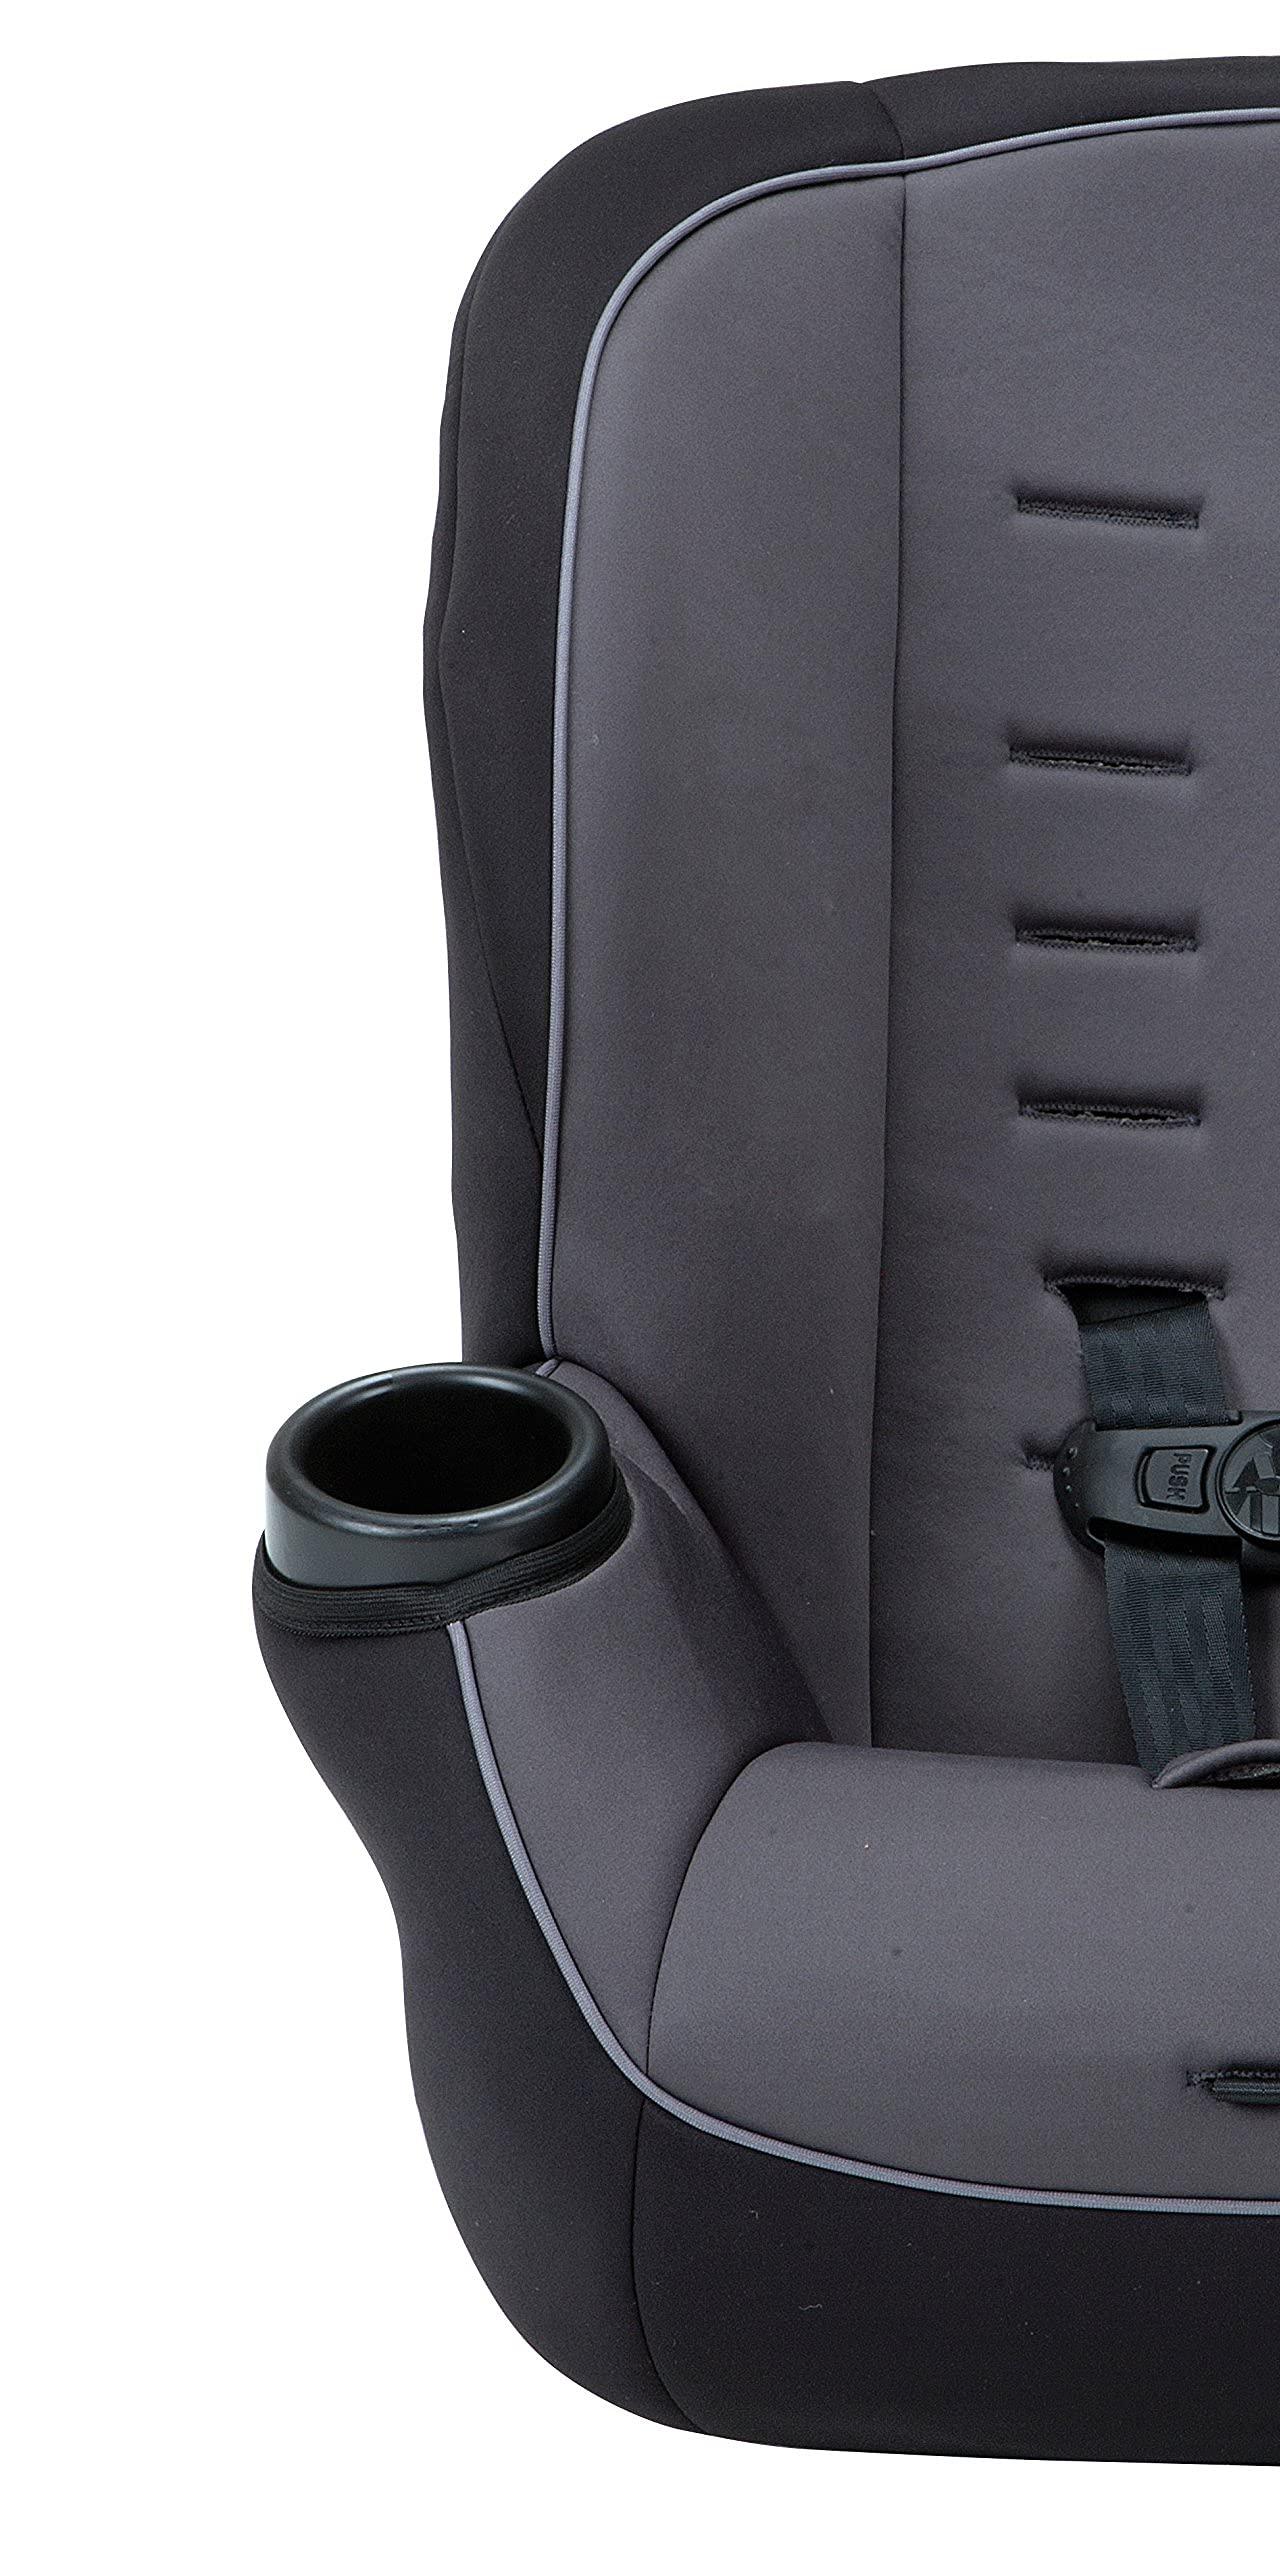 Cosco Apt 50 Convertible Car Seat (Black Arrows)